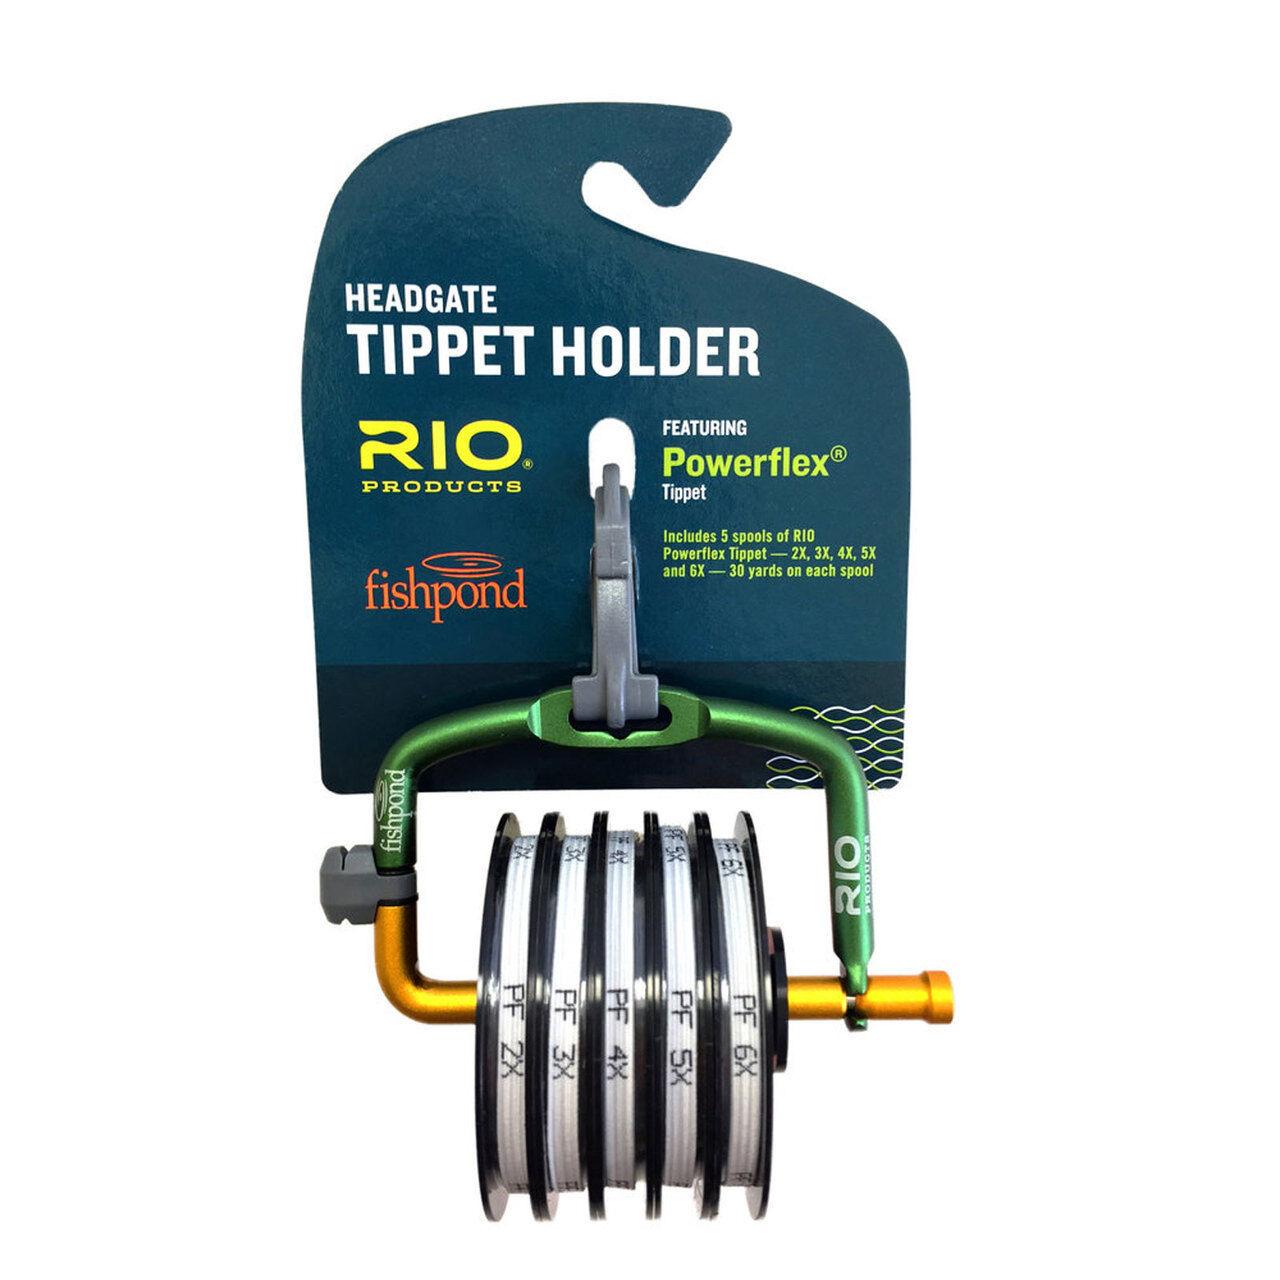 RIO FISHPOND HEADGATE TIPPET HOLDER LOADED W  5 30YD SPOOLS OF POWERFLEX TIPPET